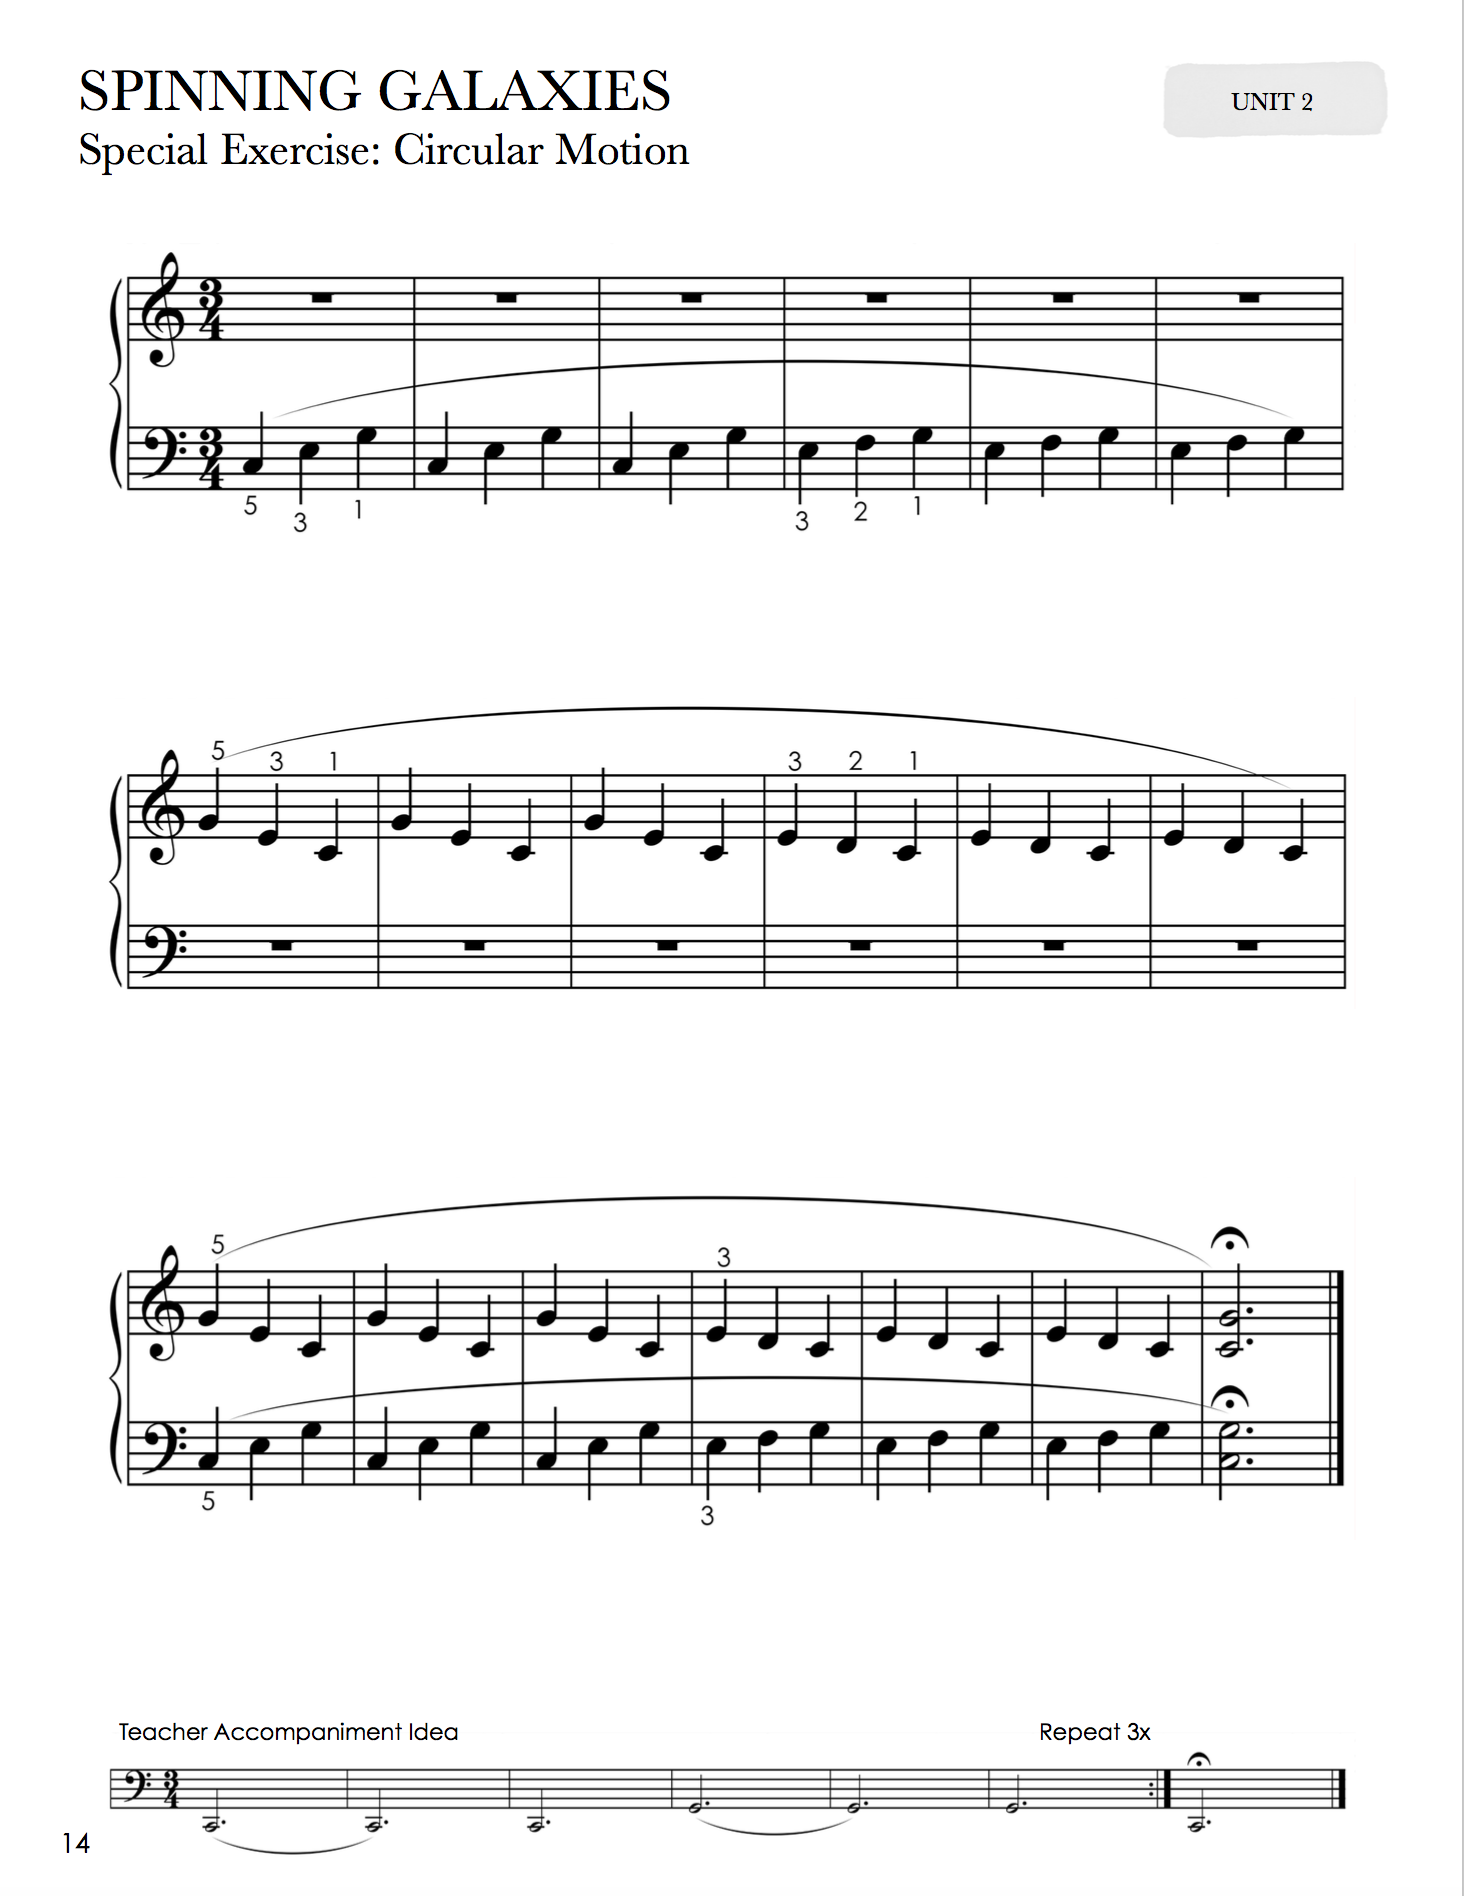 MOVIMENTO CIRCULAR AO PIANO LIVRO DE TECNICA 2 PIANO SAFARI LOJA MINEIRA DO MUSICO BRASIL